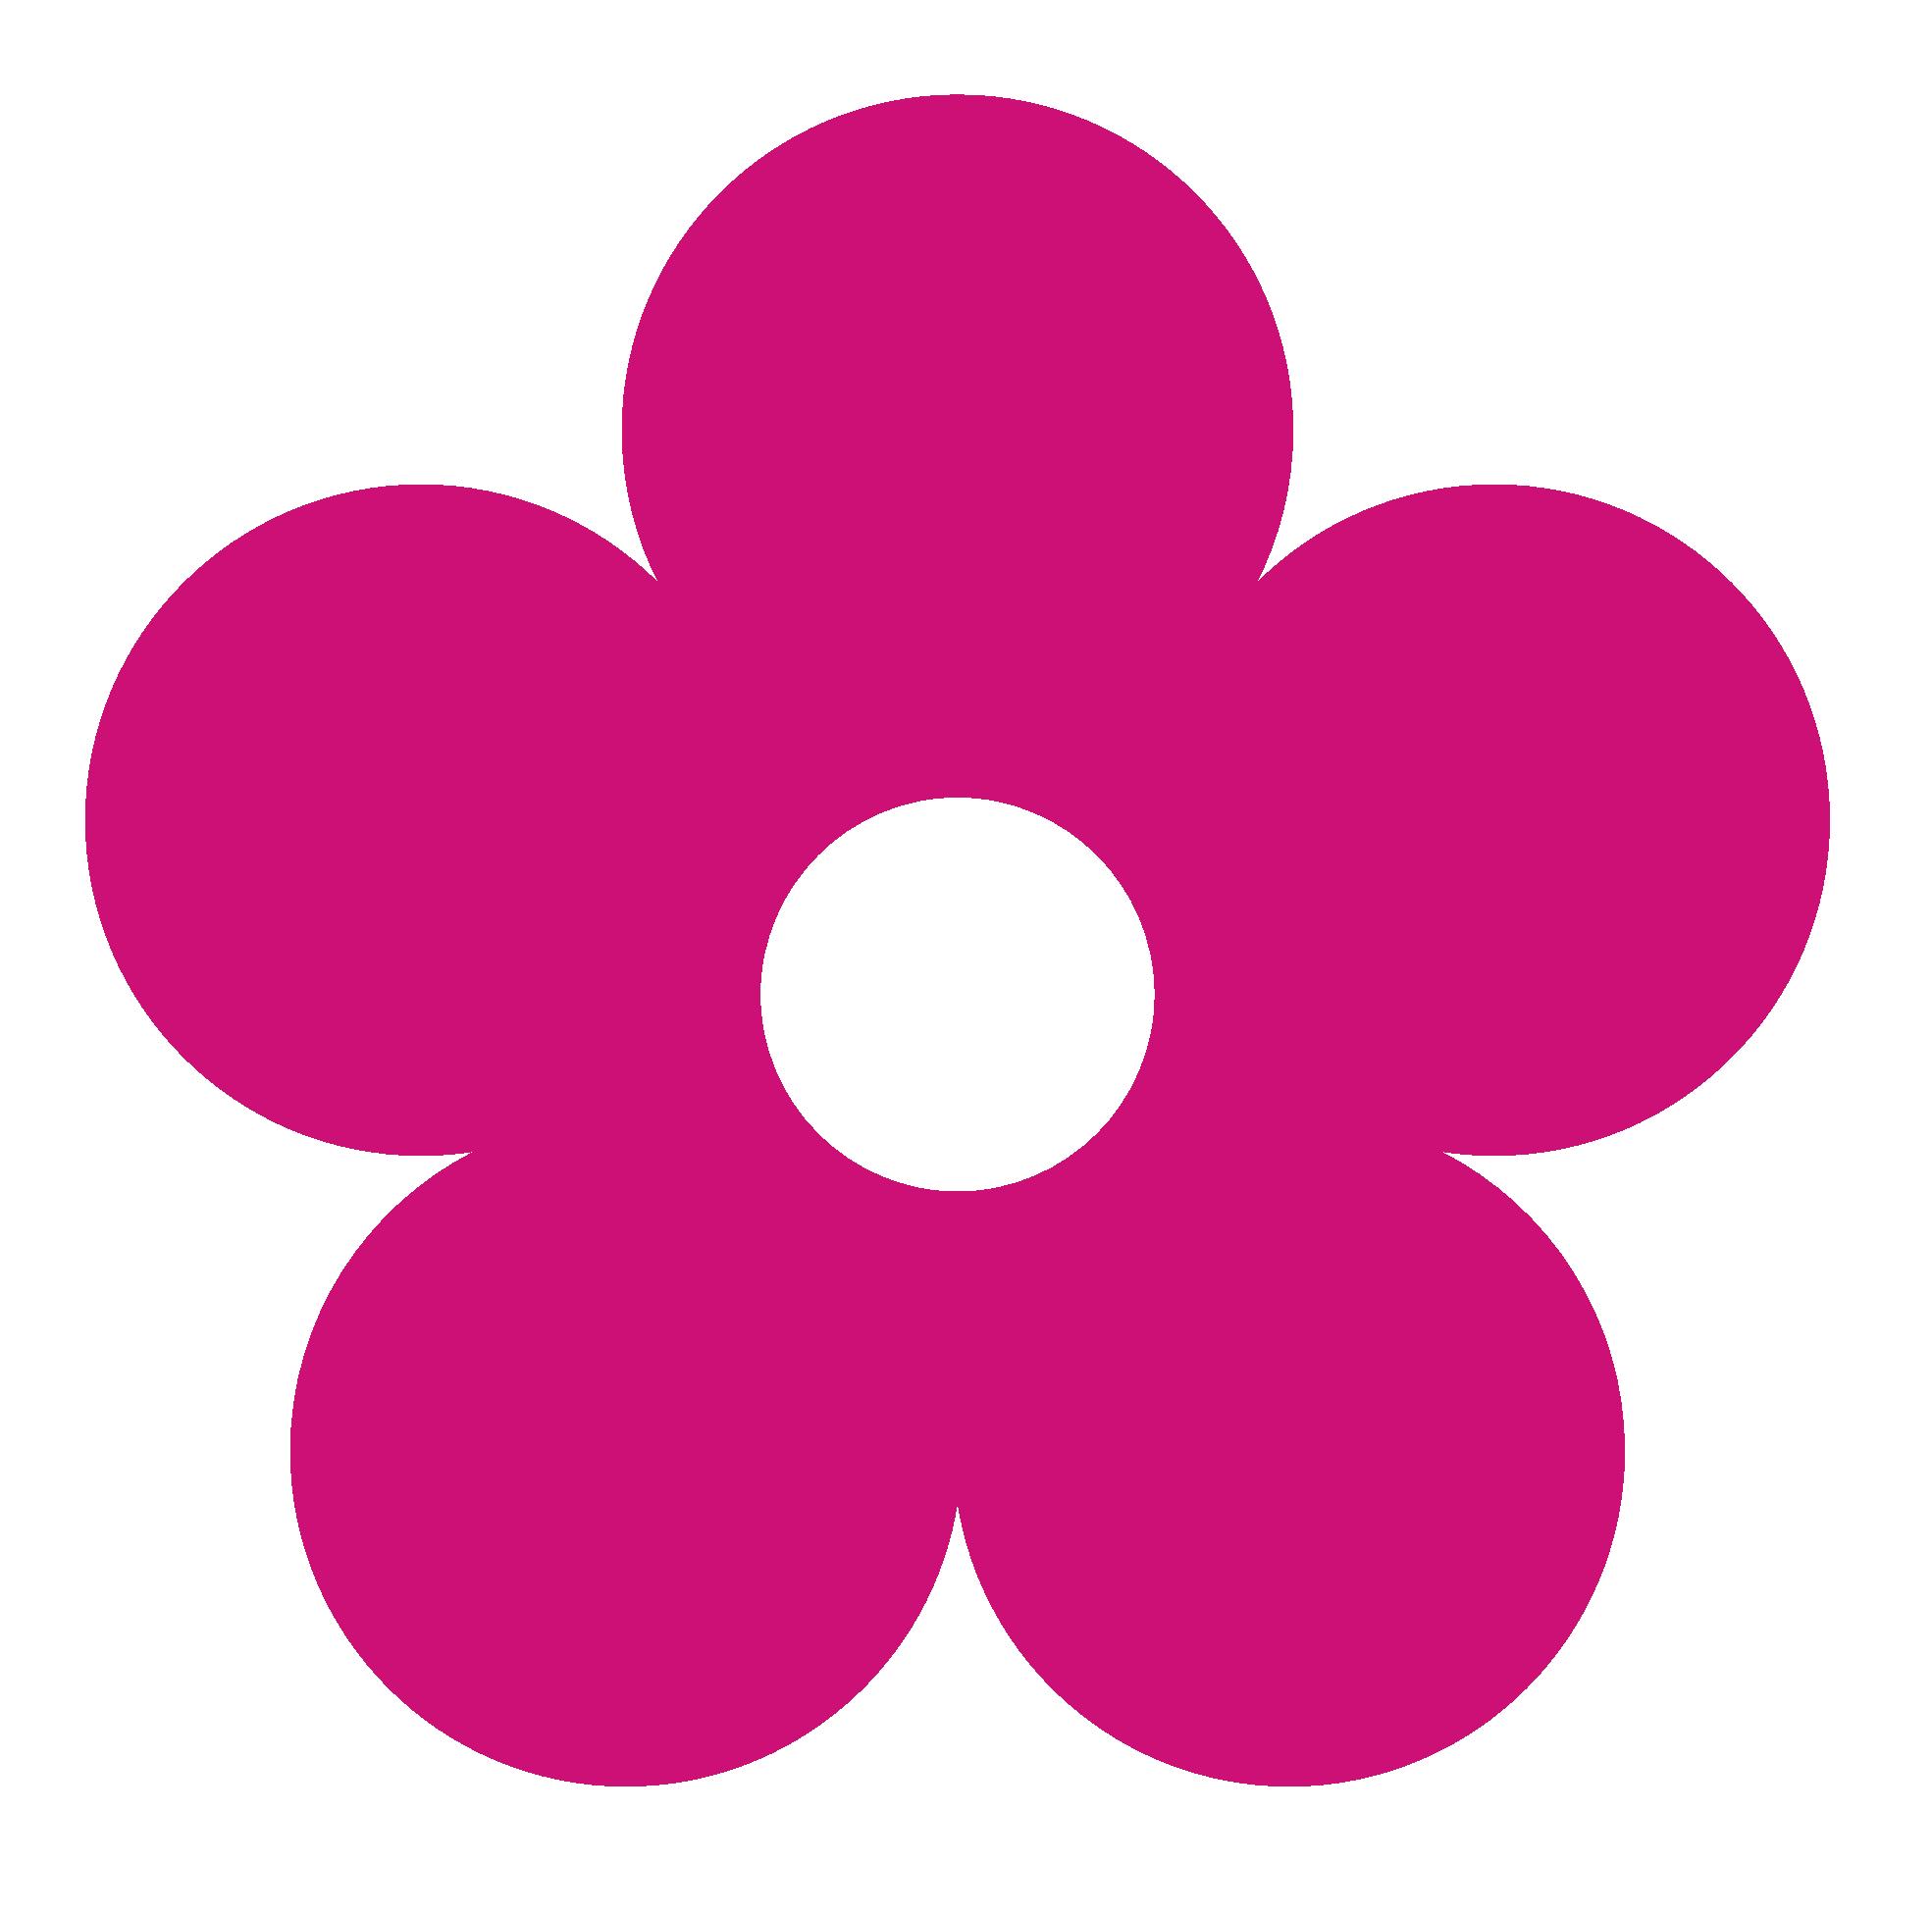 The Blue Flower Clip art.